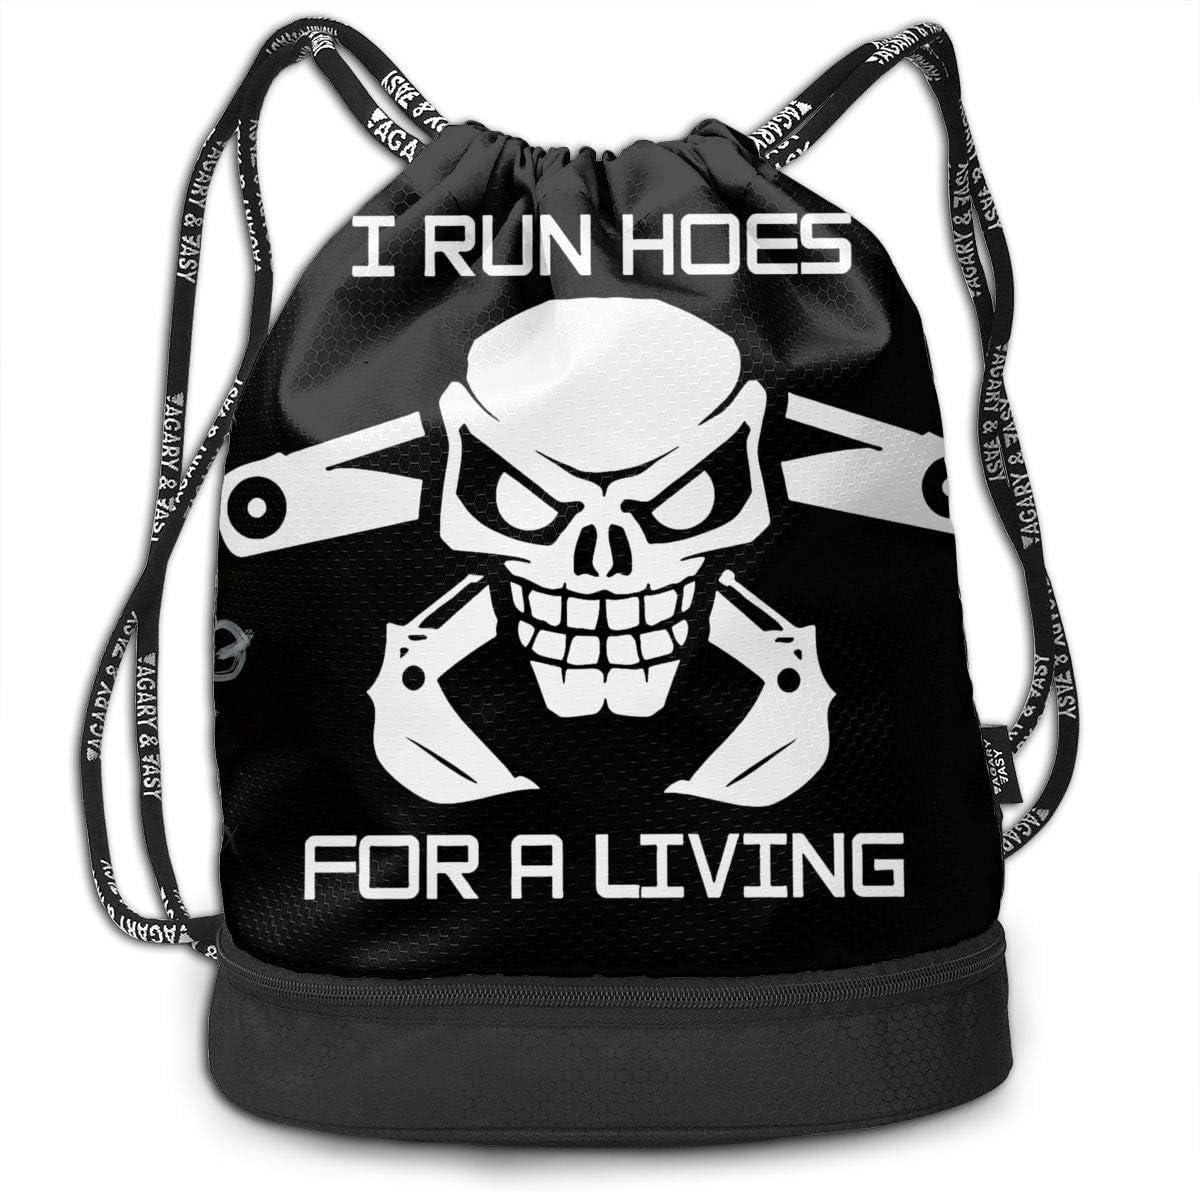 Thomas C Gaona I Run Hoes for Money Original Shoulder Bag Drawstring Backpack Beam Mouth Single Pocket Outdoor Shopping Bag Backpack